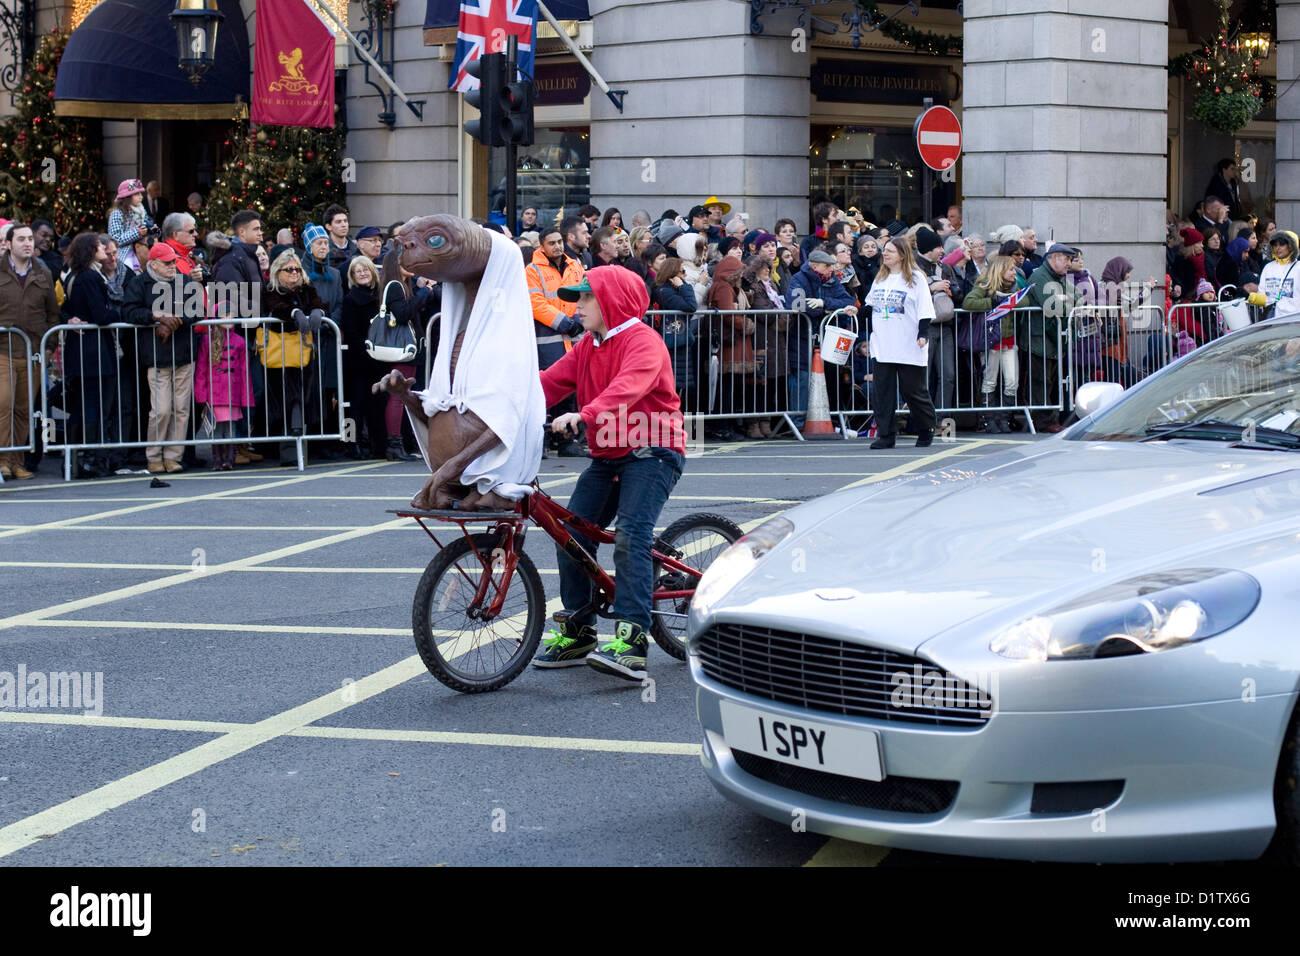 I Spy Aston Martin with Elliot and ET on a push bike - Stock Image